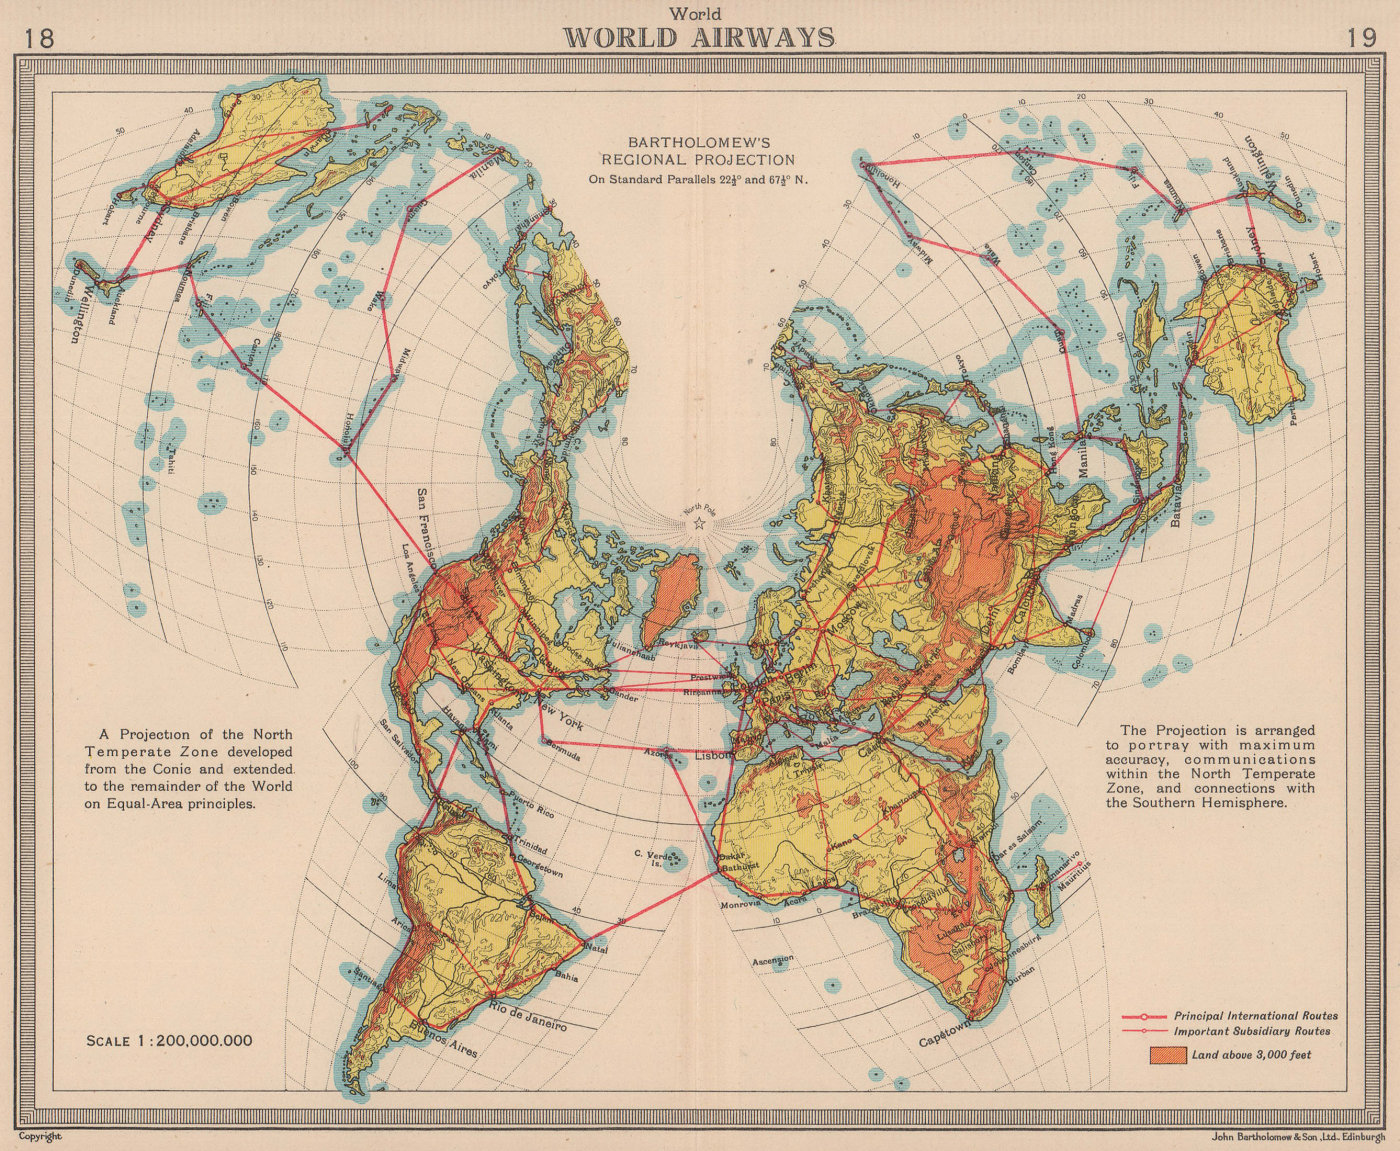 World Airways. Air routes. BARTHOLOMEW 1949 old vintage map plan chart